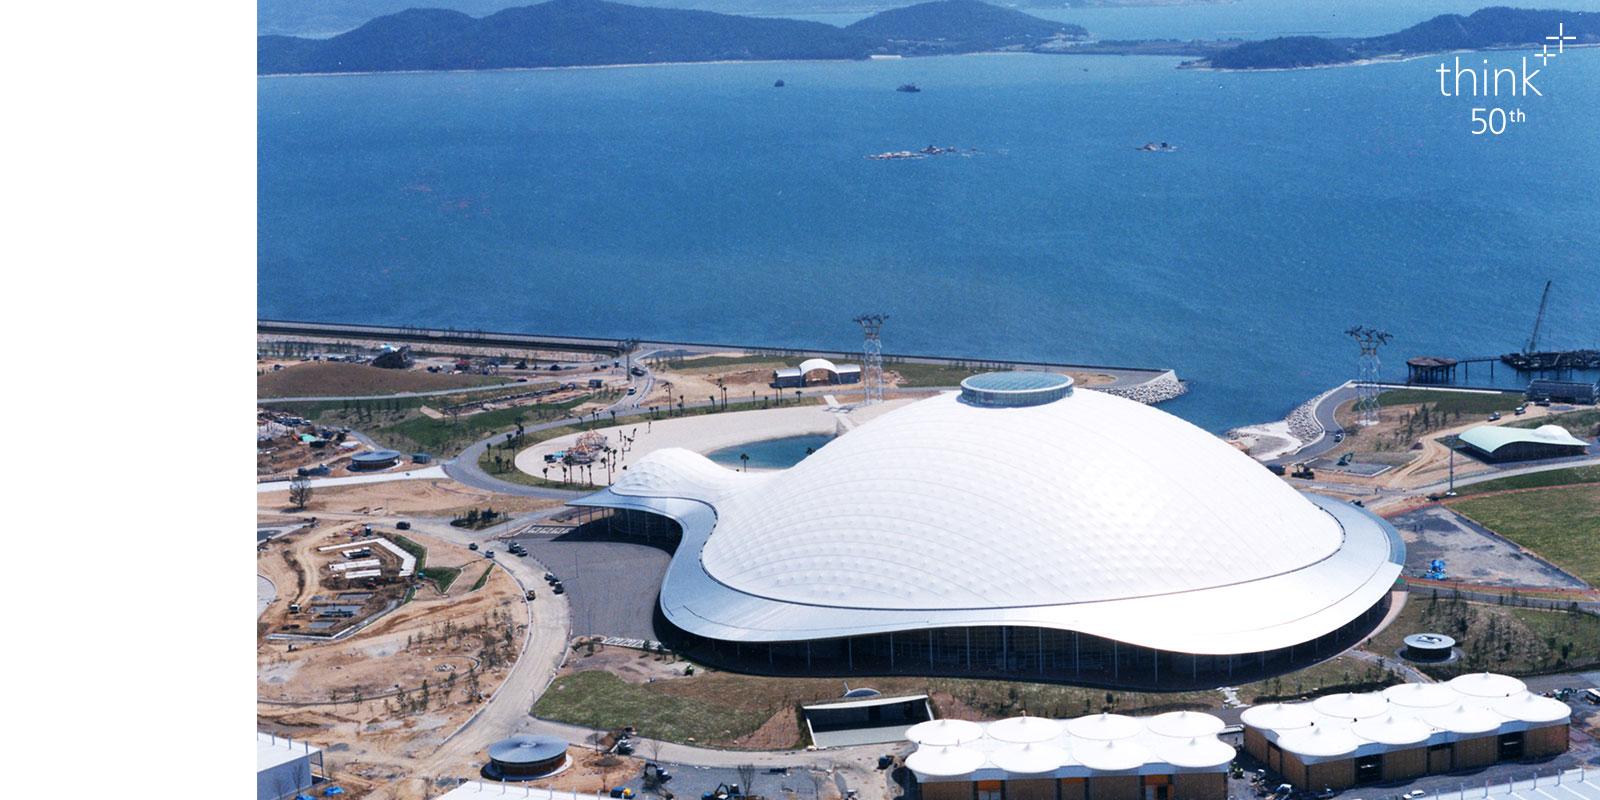 Tsuruoka City Kamo Aquarium 2014